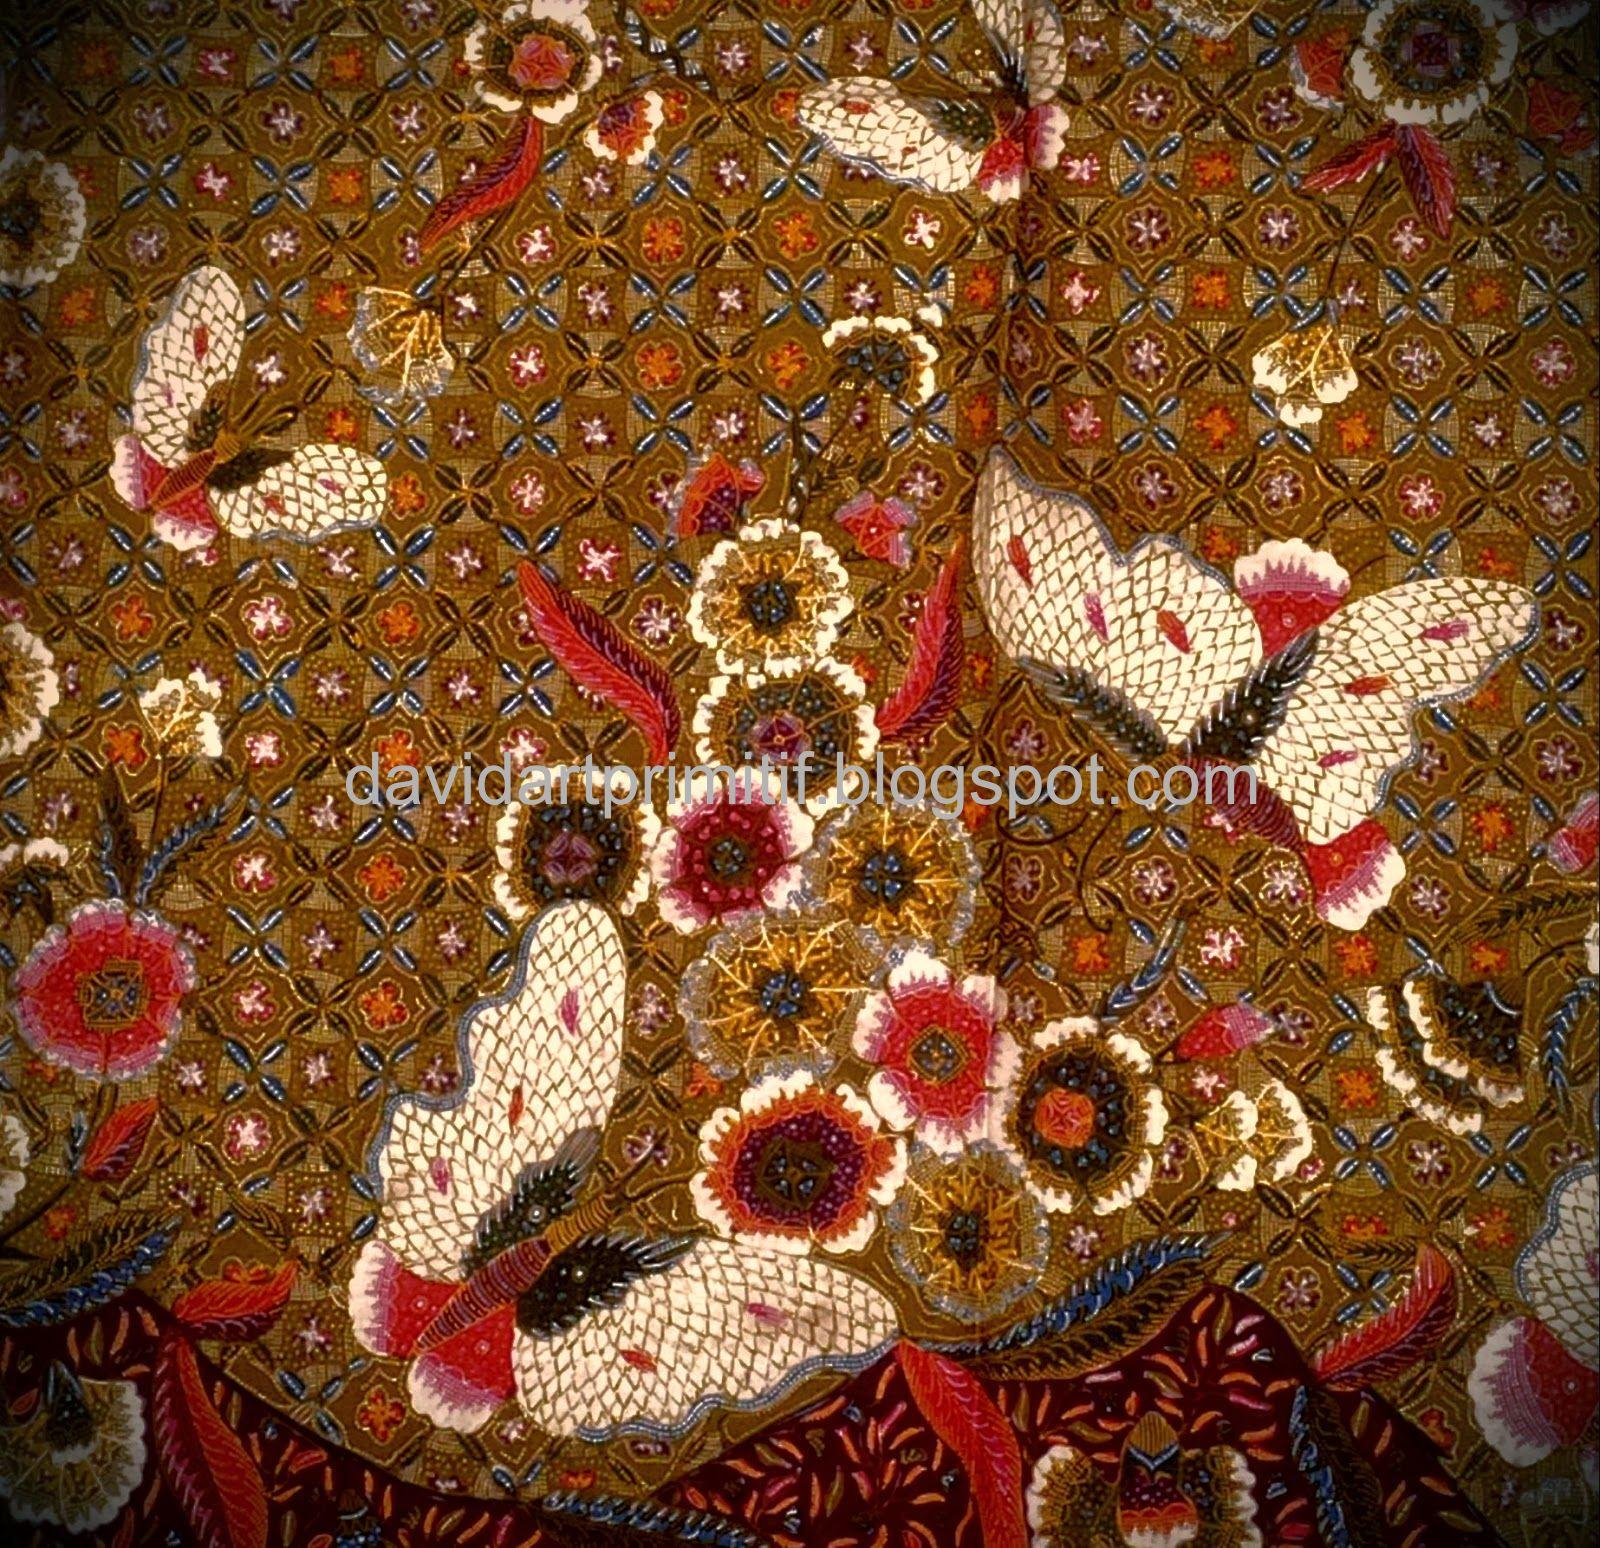 4 Penemu Batik Tulis: Art & Primitif: Kain Batik Tulis HoKoKai